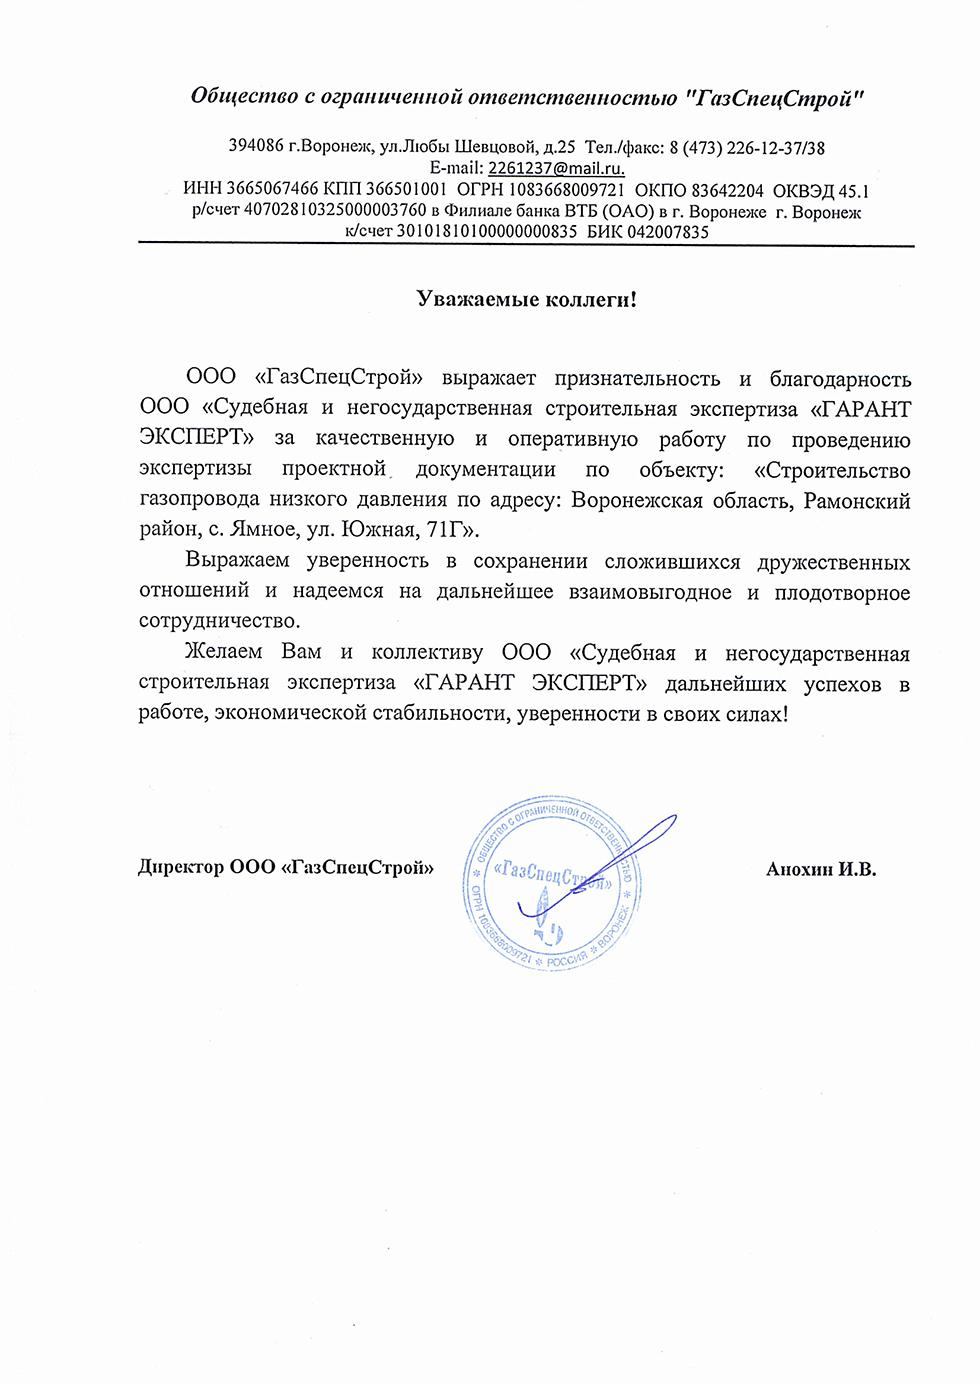 ГазСпецСтрой